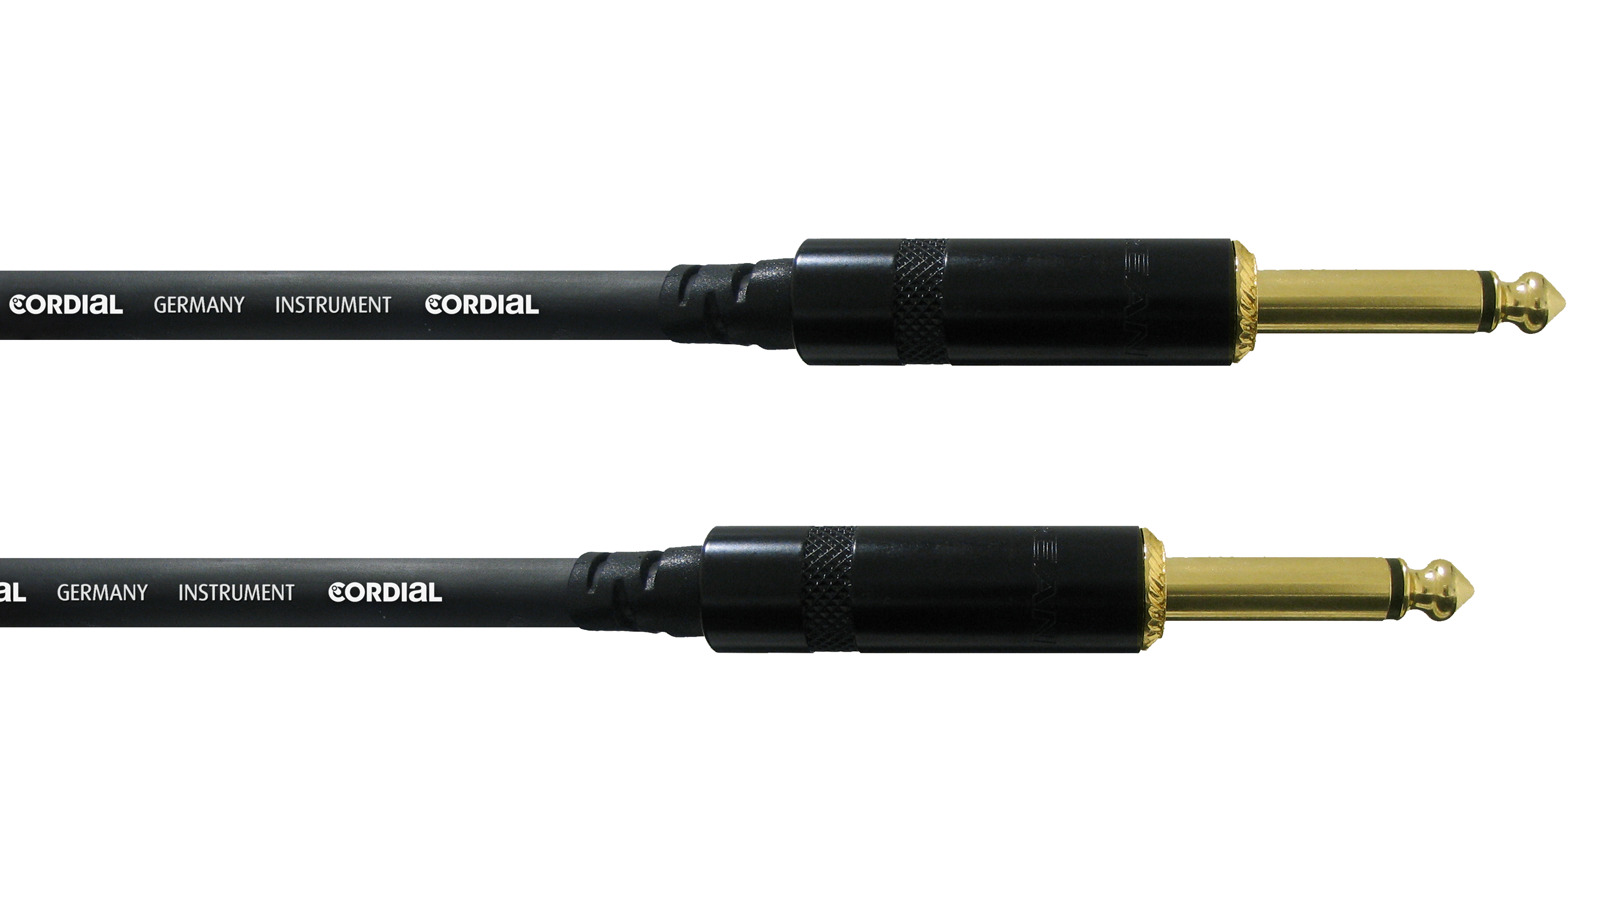 Cordial CCI 1,5 PP Instrumentenkabel 1,5 m